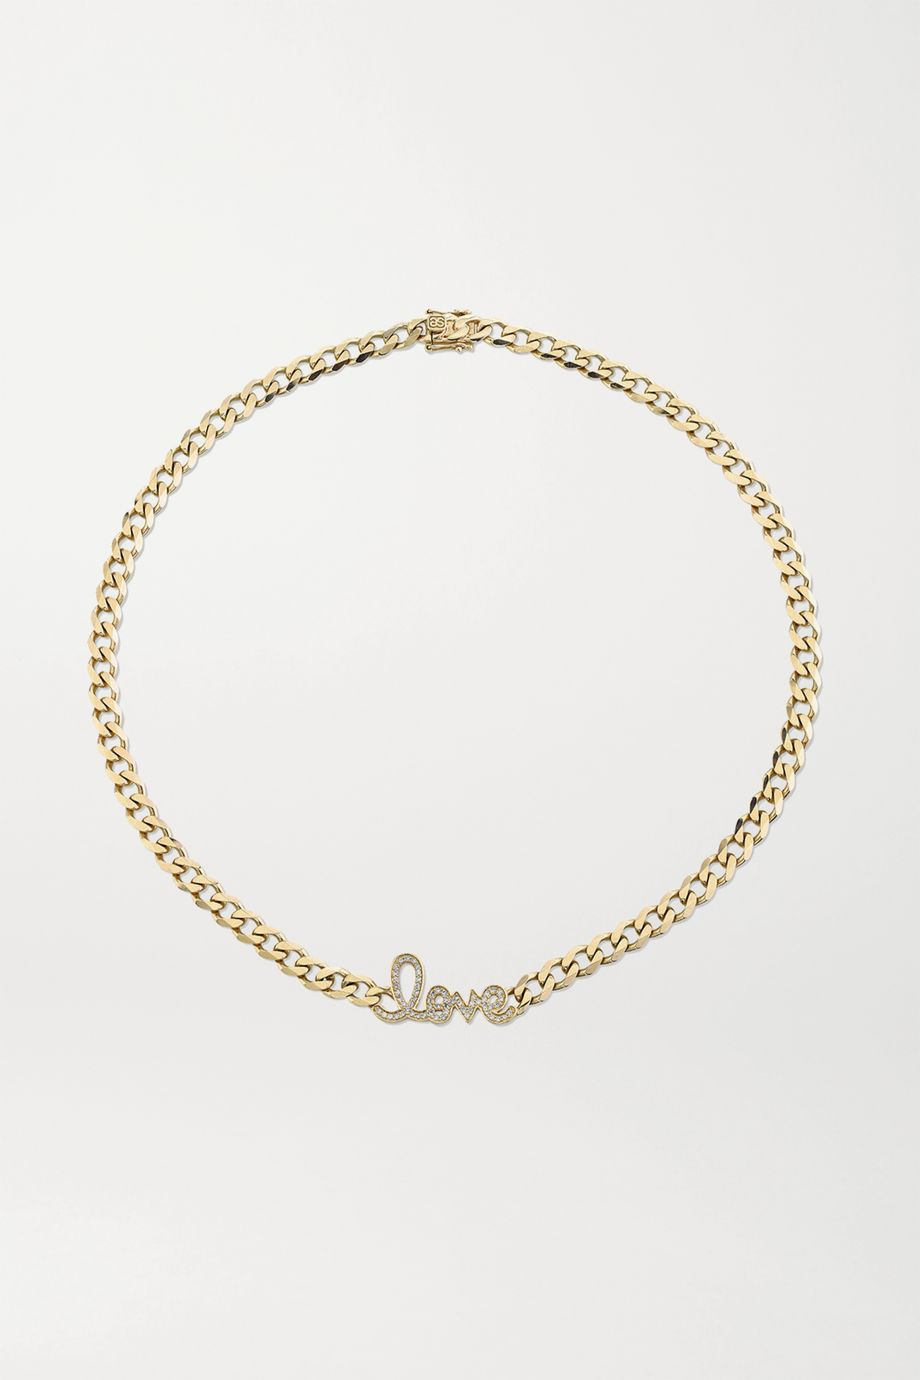 Sydney Evan Large Love 14-karat gold diamond necklace